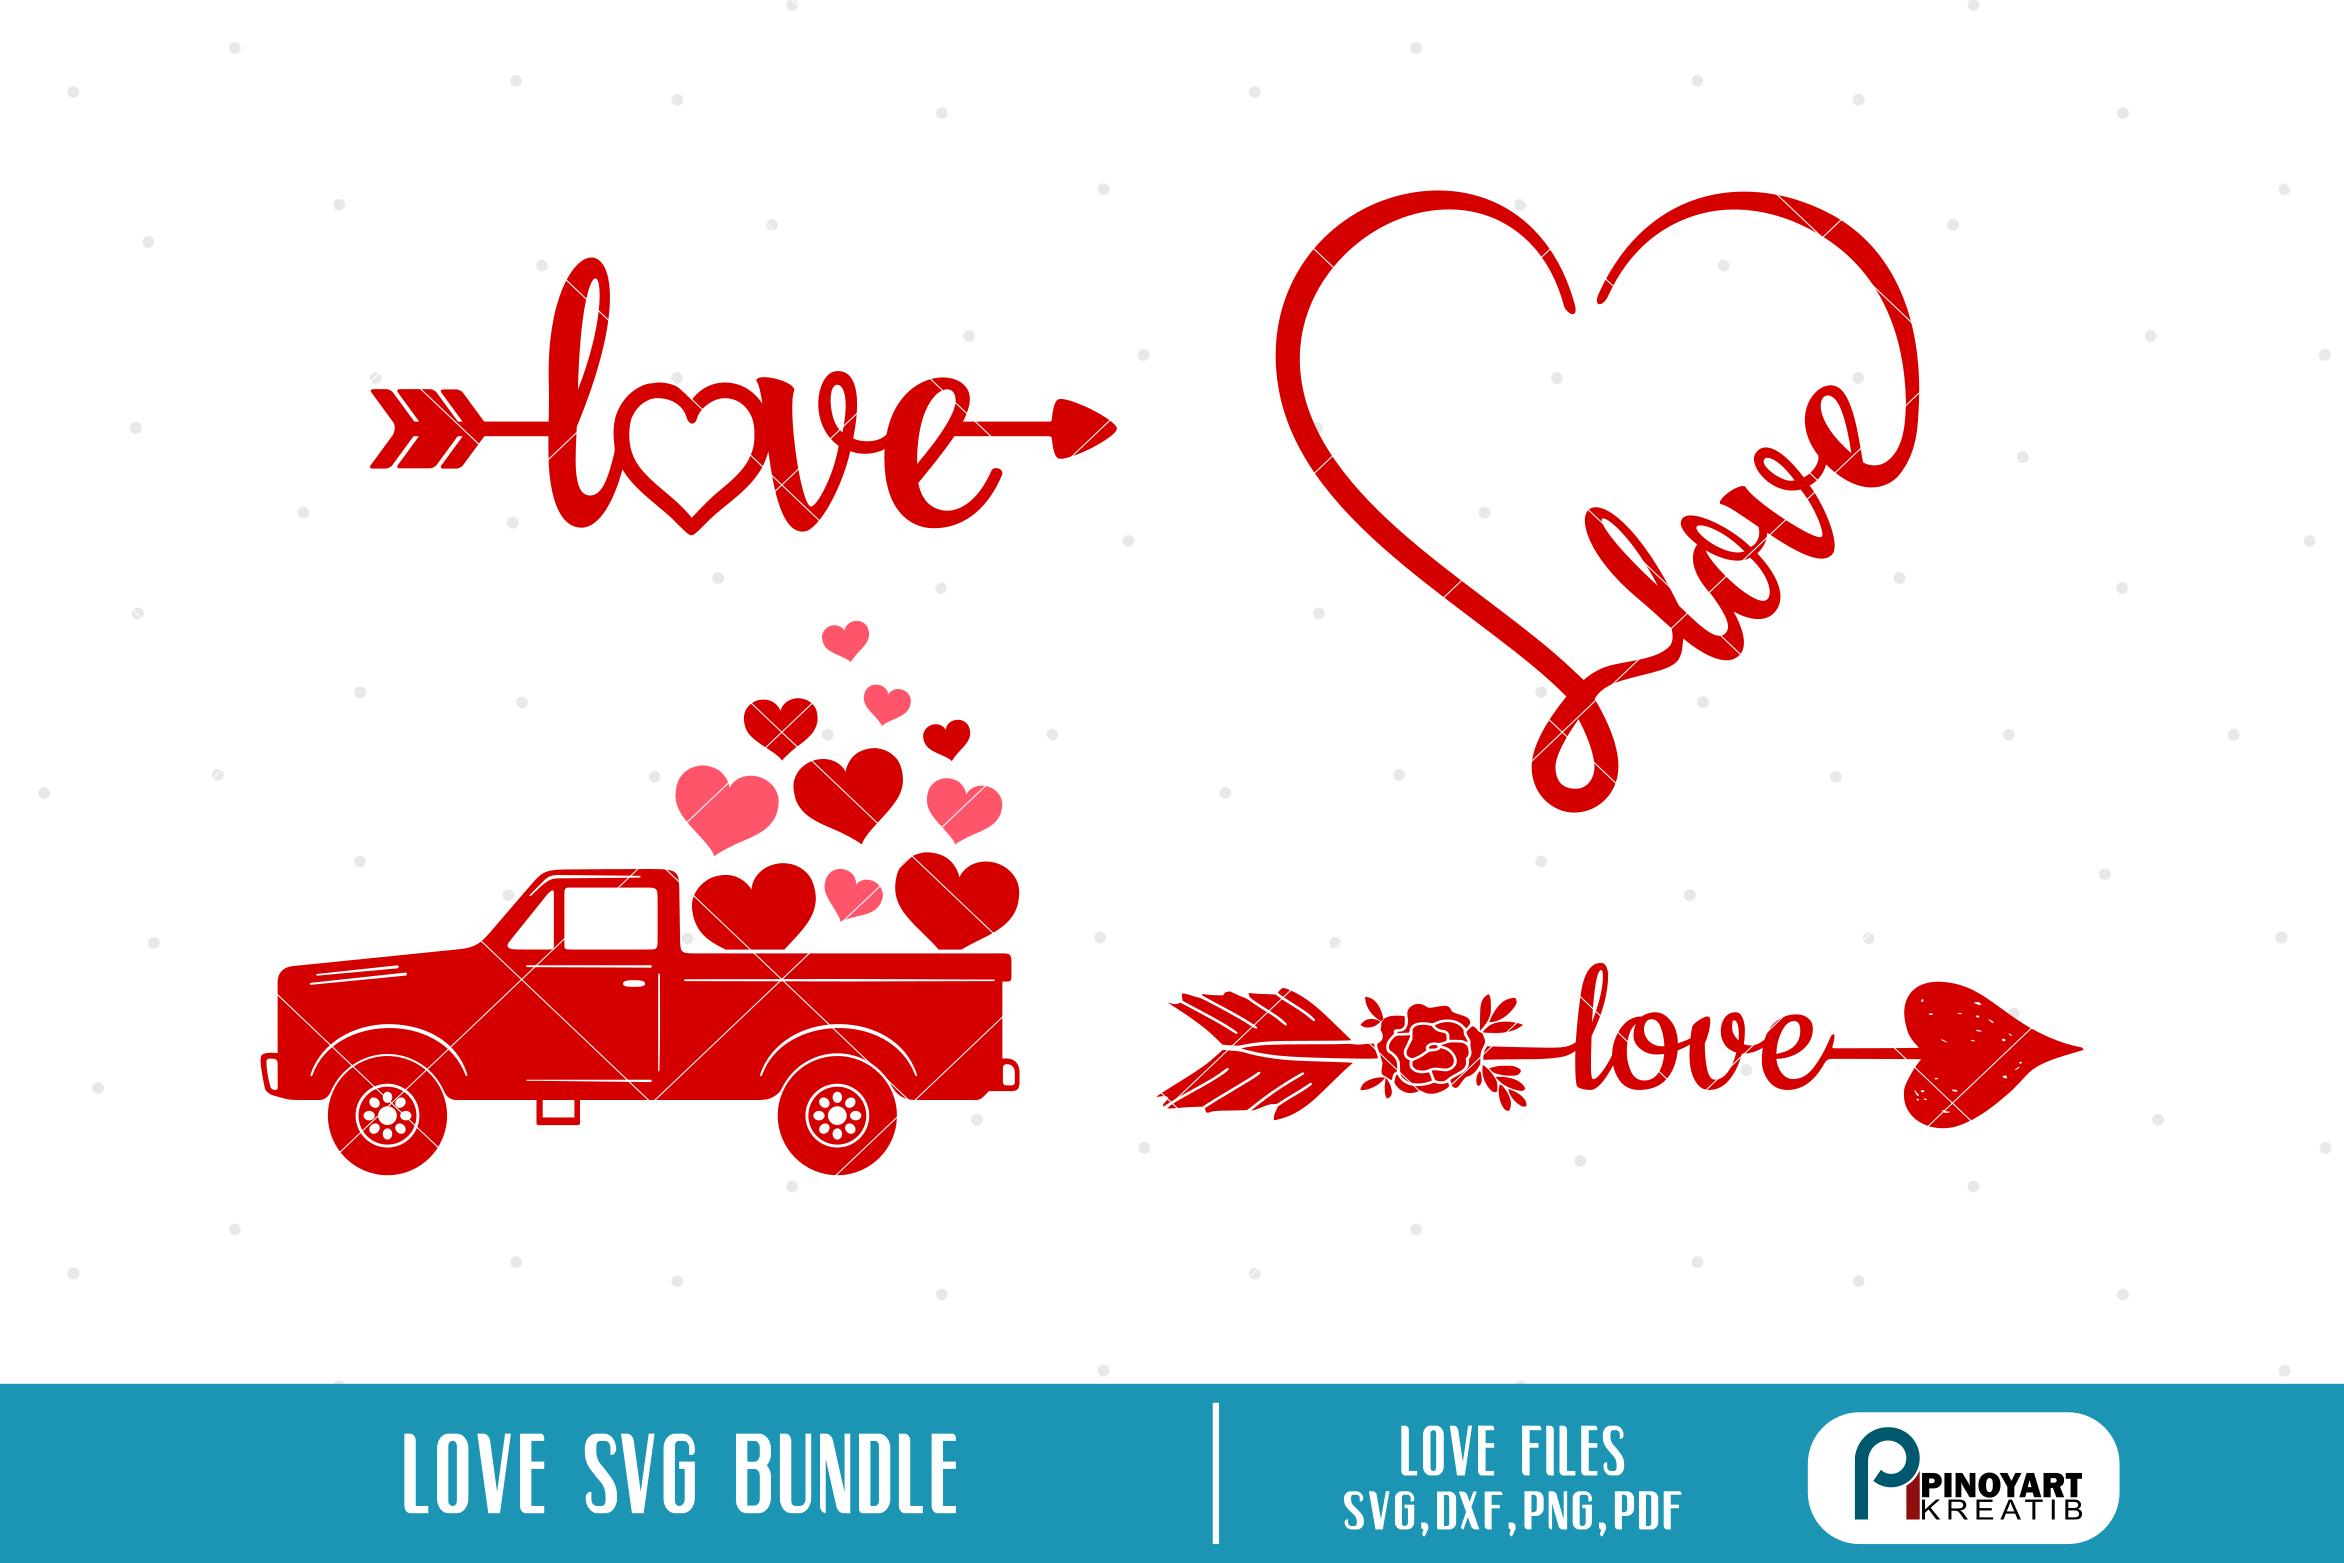 Download Love SVG Bundle - love vector files | Svg files for cricut ...